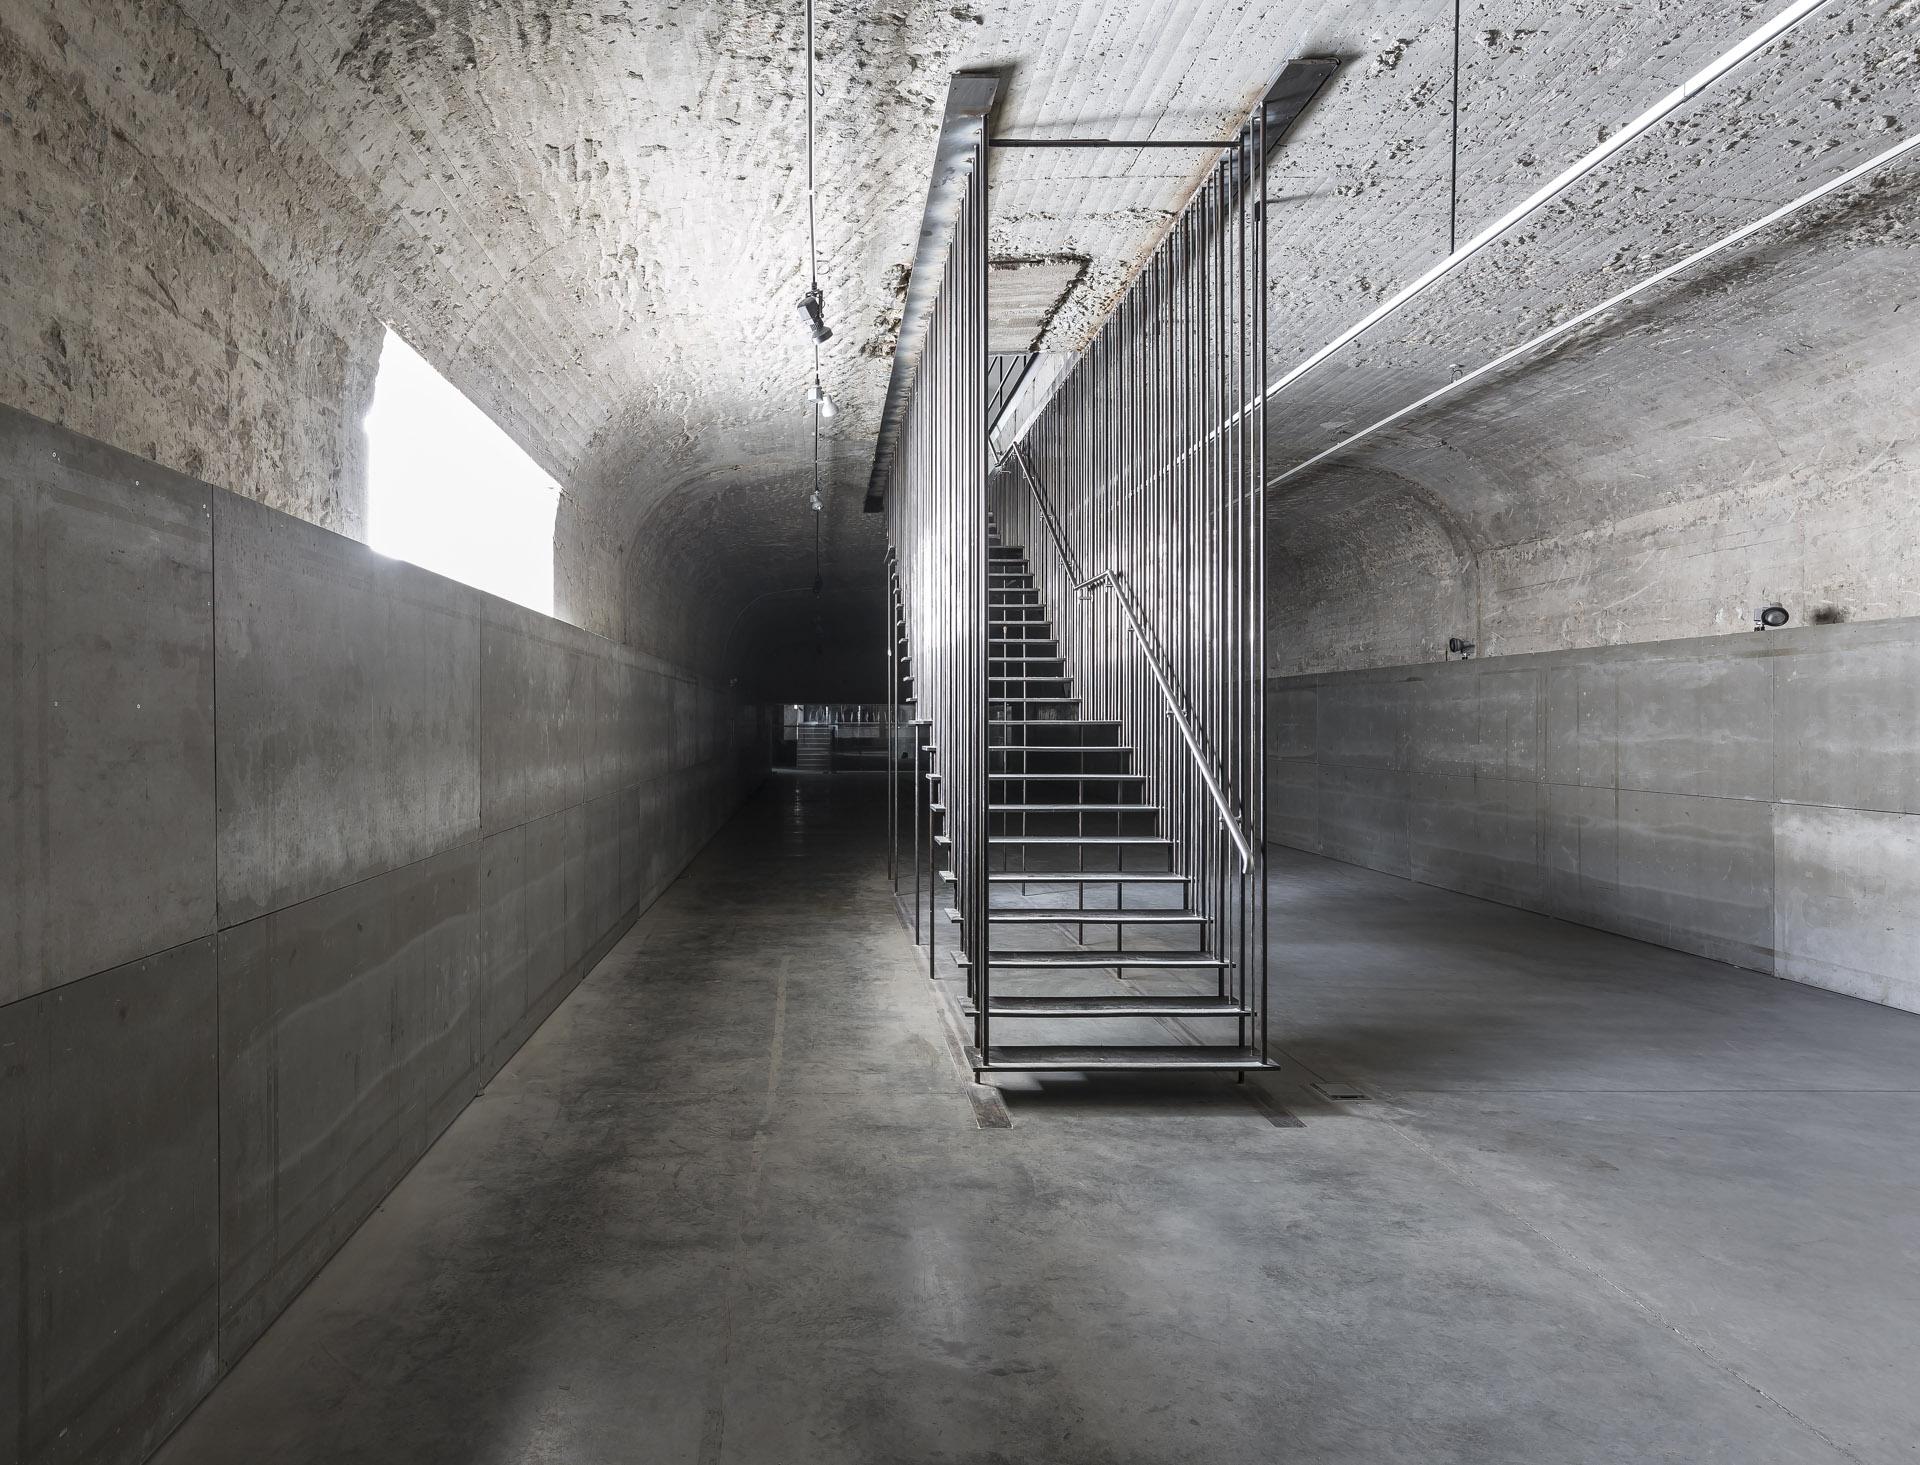 fotografia-arquitectura-madrid-nuevos-ministerios-elorza-german-cabo-13